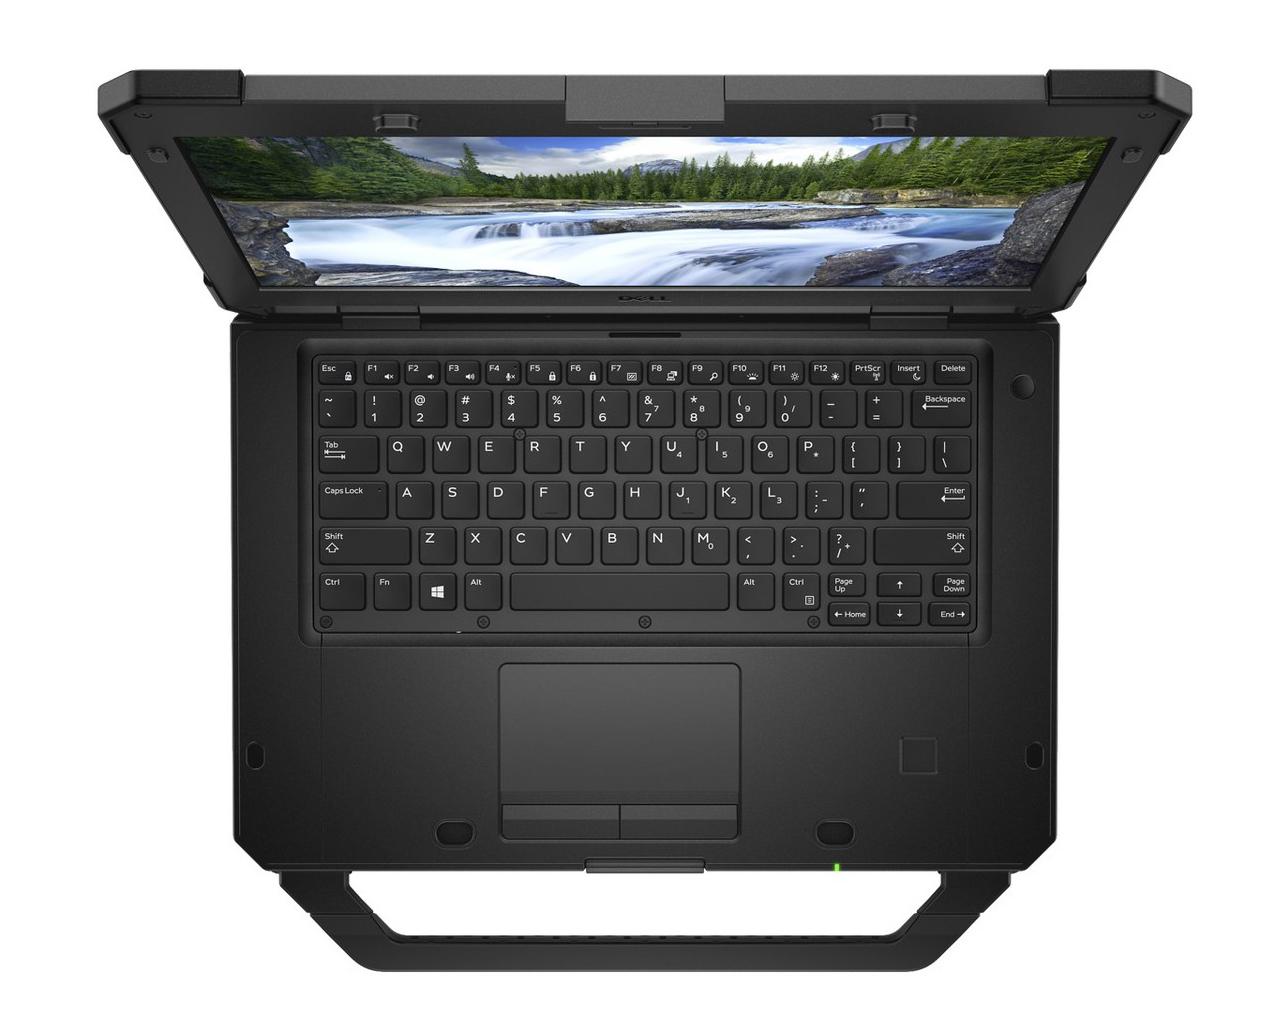 Dell Latitude 14 Rugged Series - Notebookcheck net External Reviews